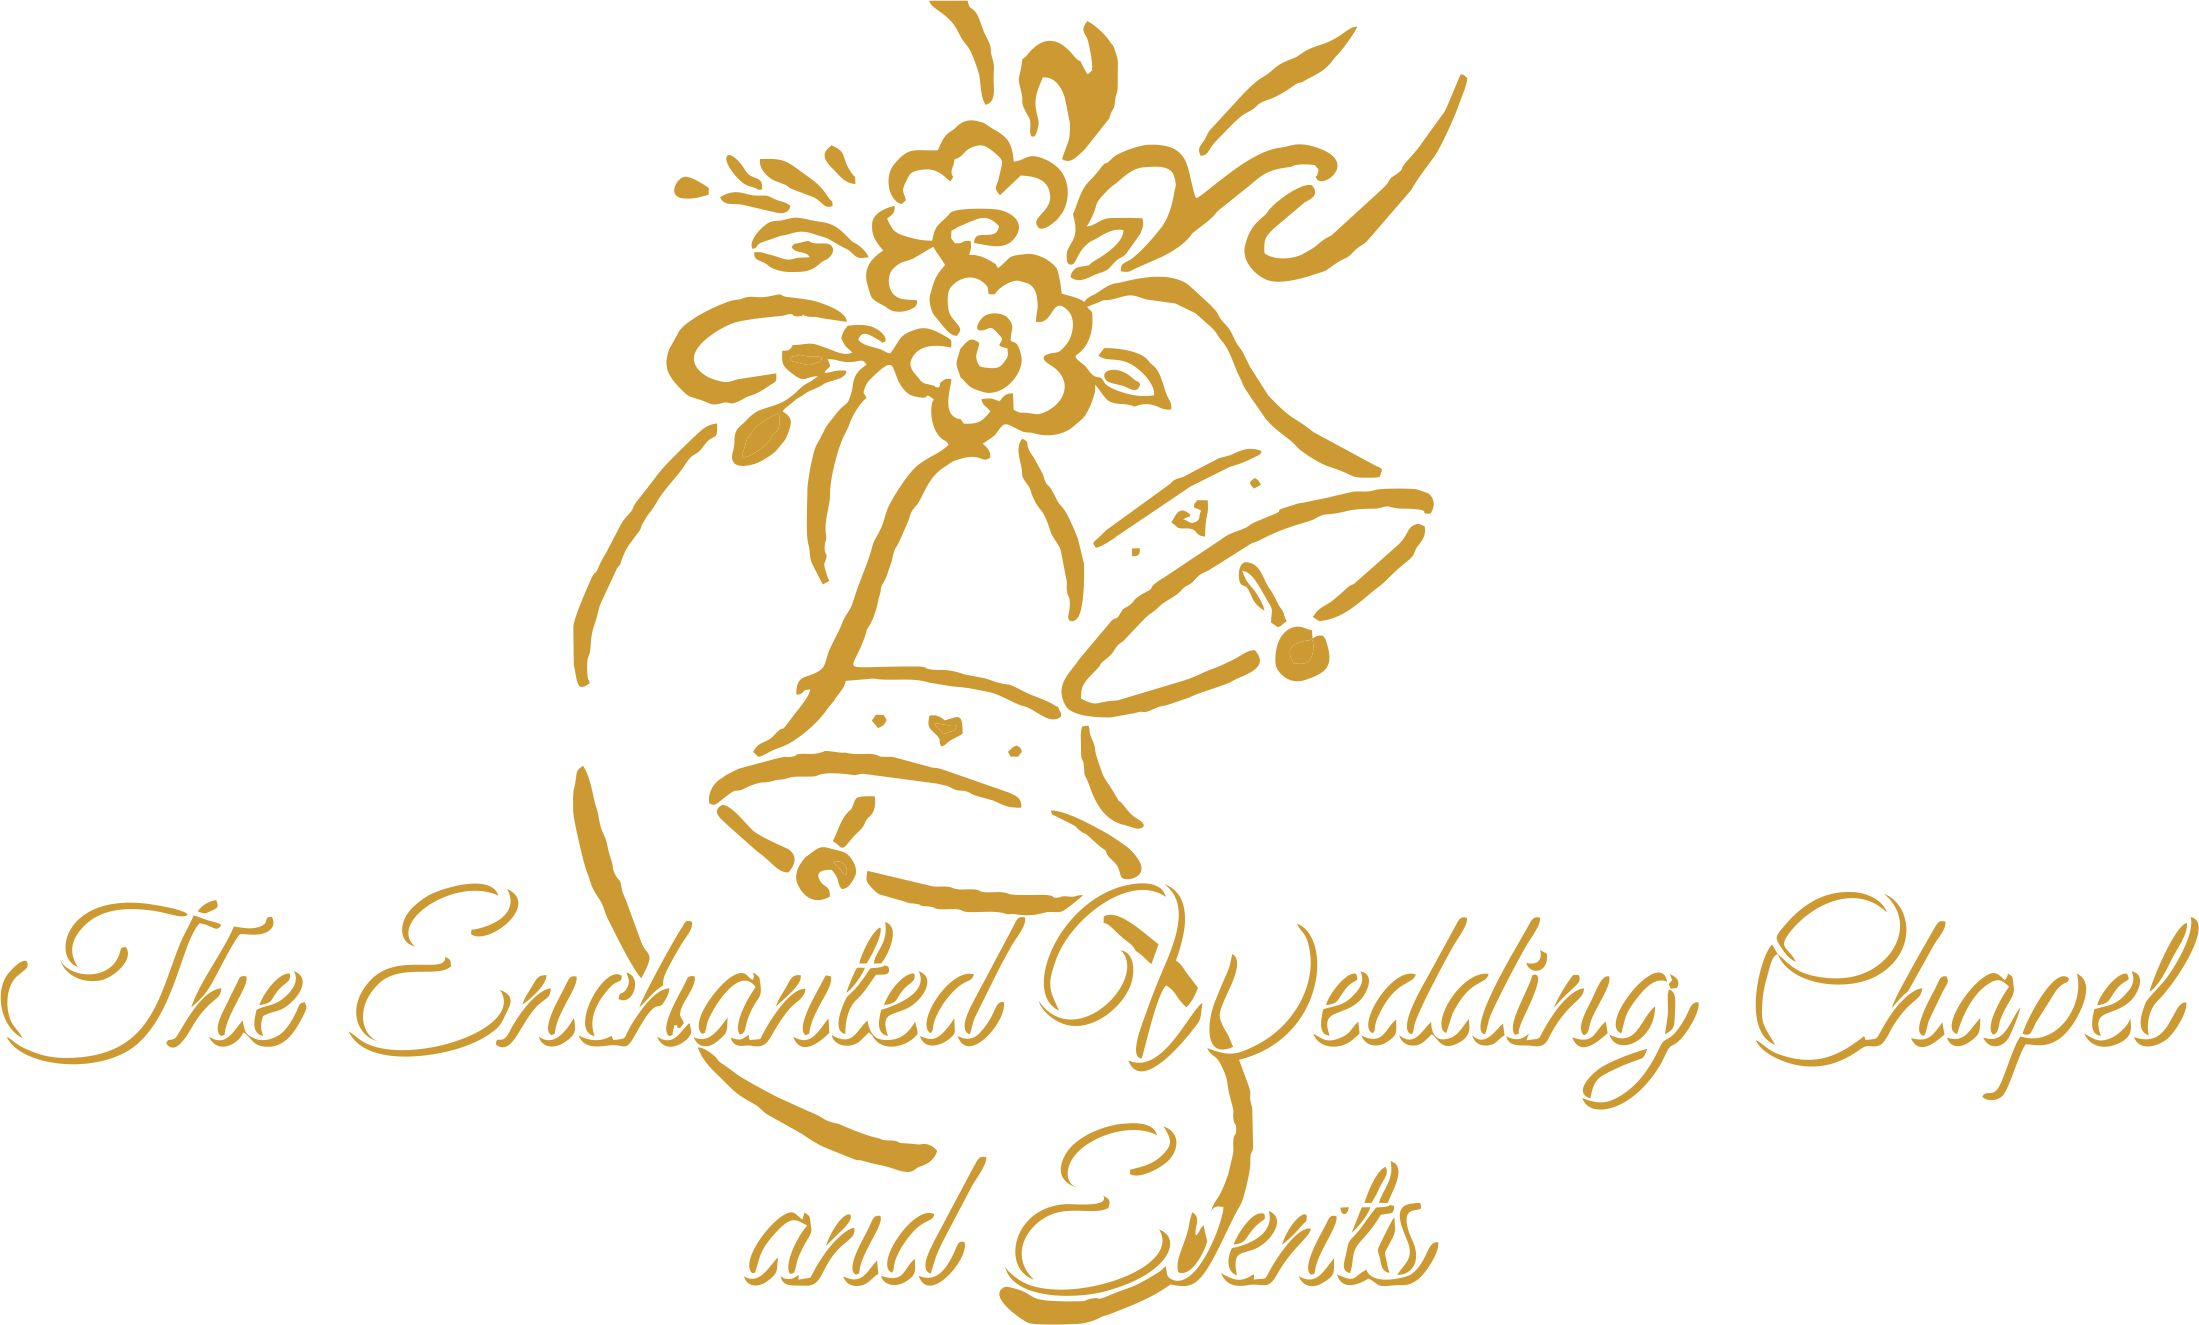 The Enchanted Wedding Chapel And Events Venue LLC